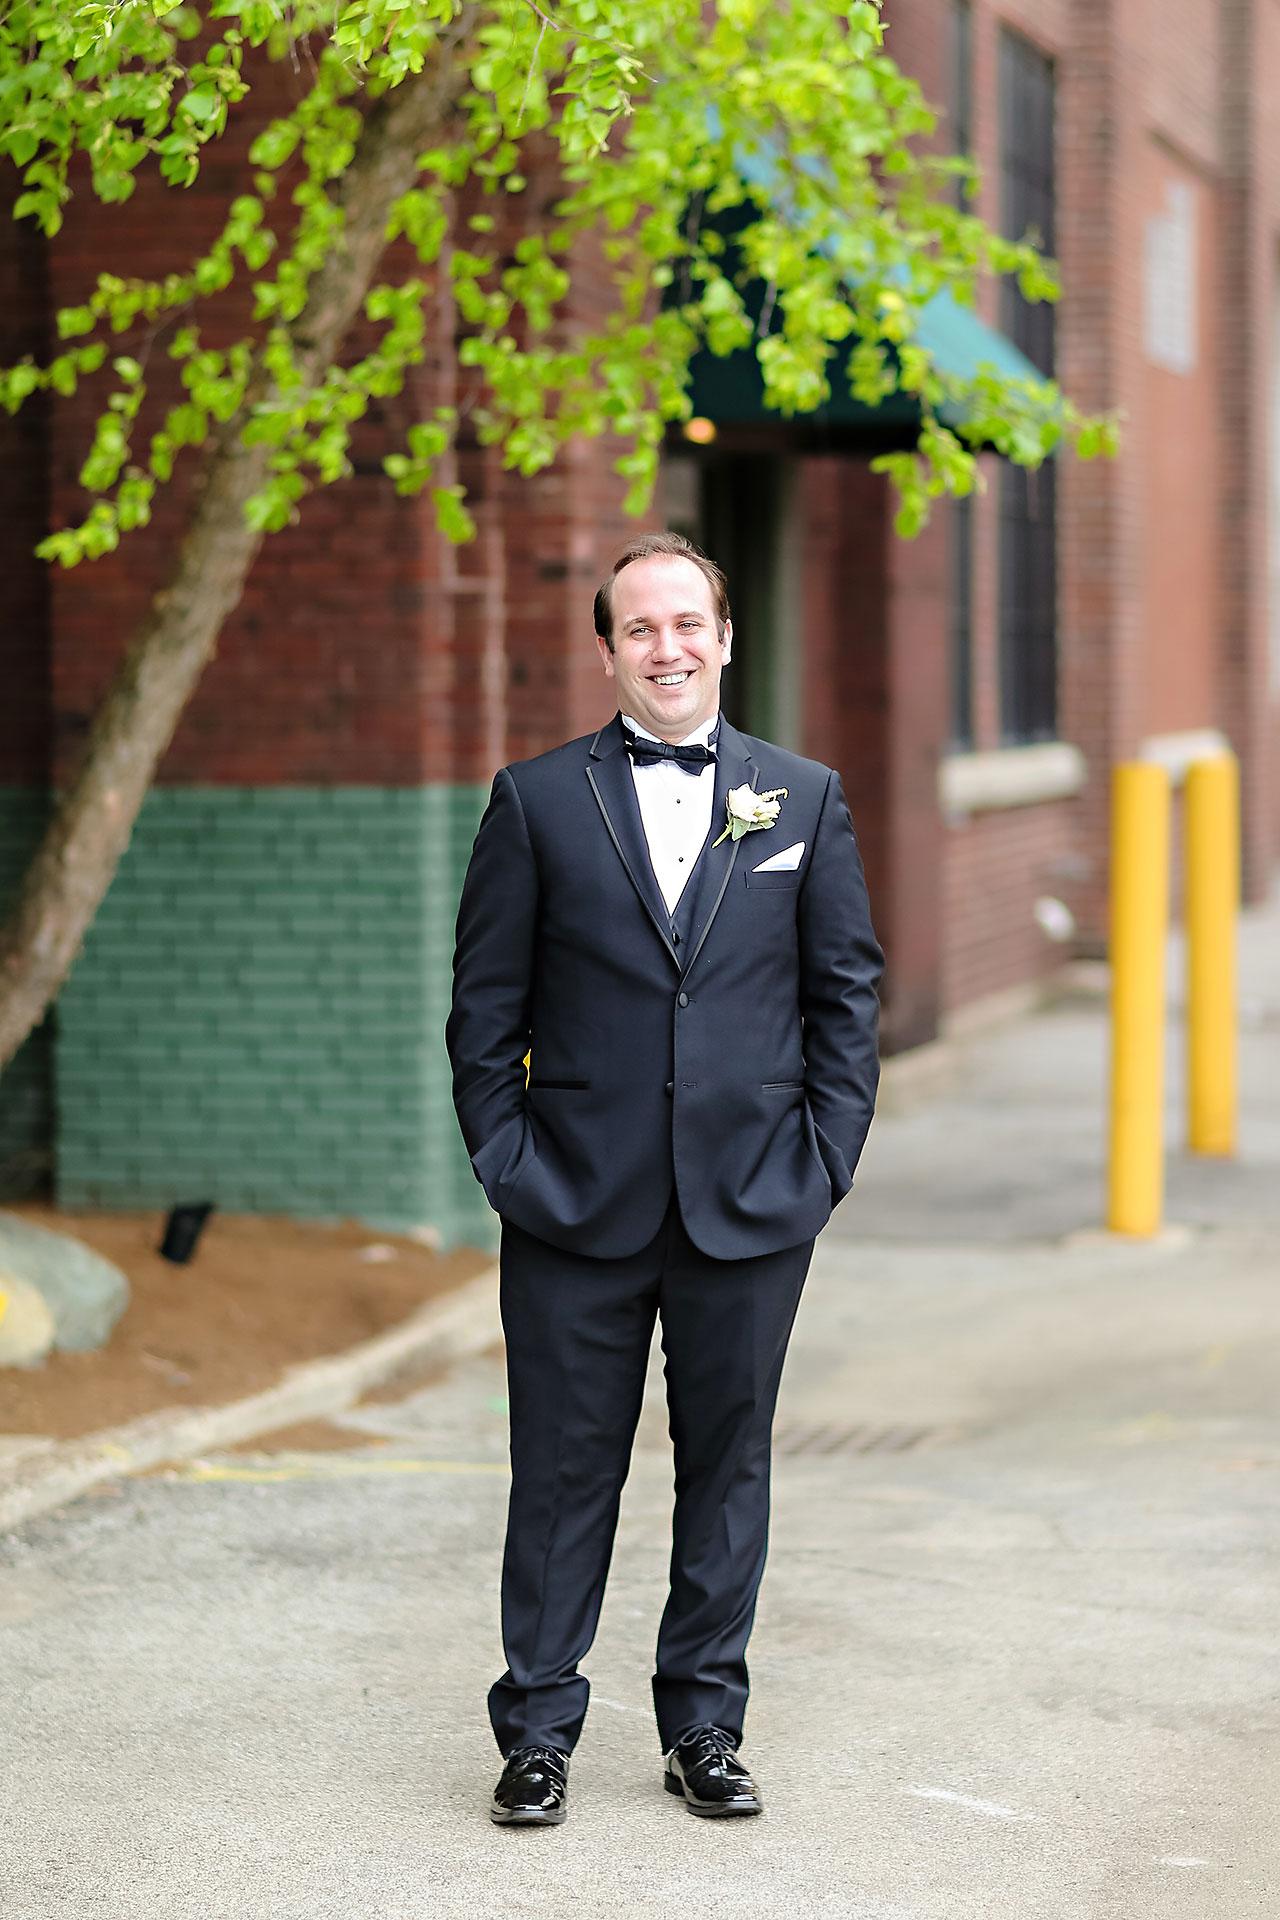 Allison Jeff Union Station Crowne Plaza Indianapolis wedding 150